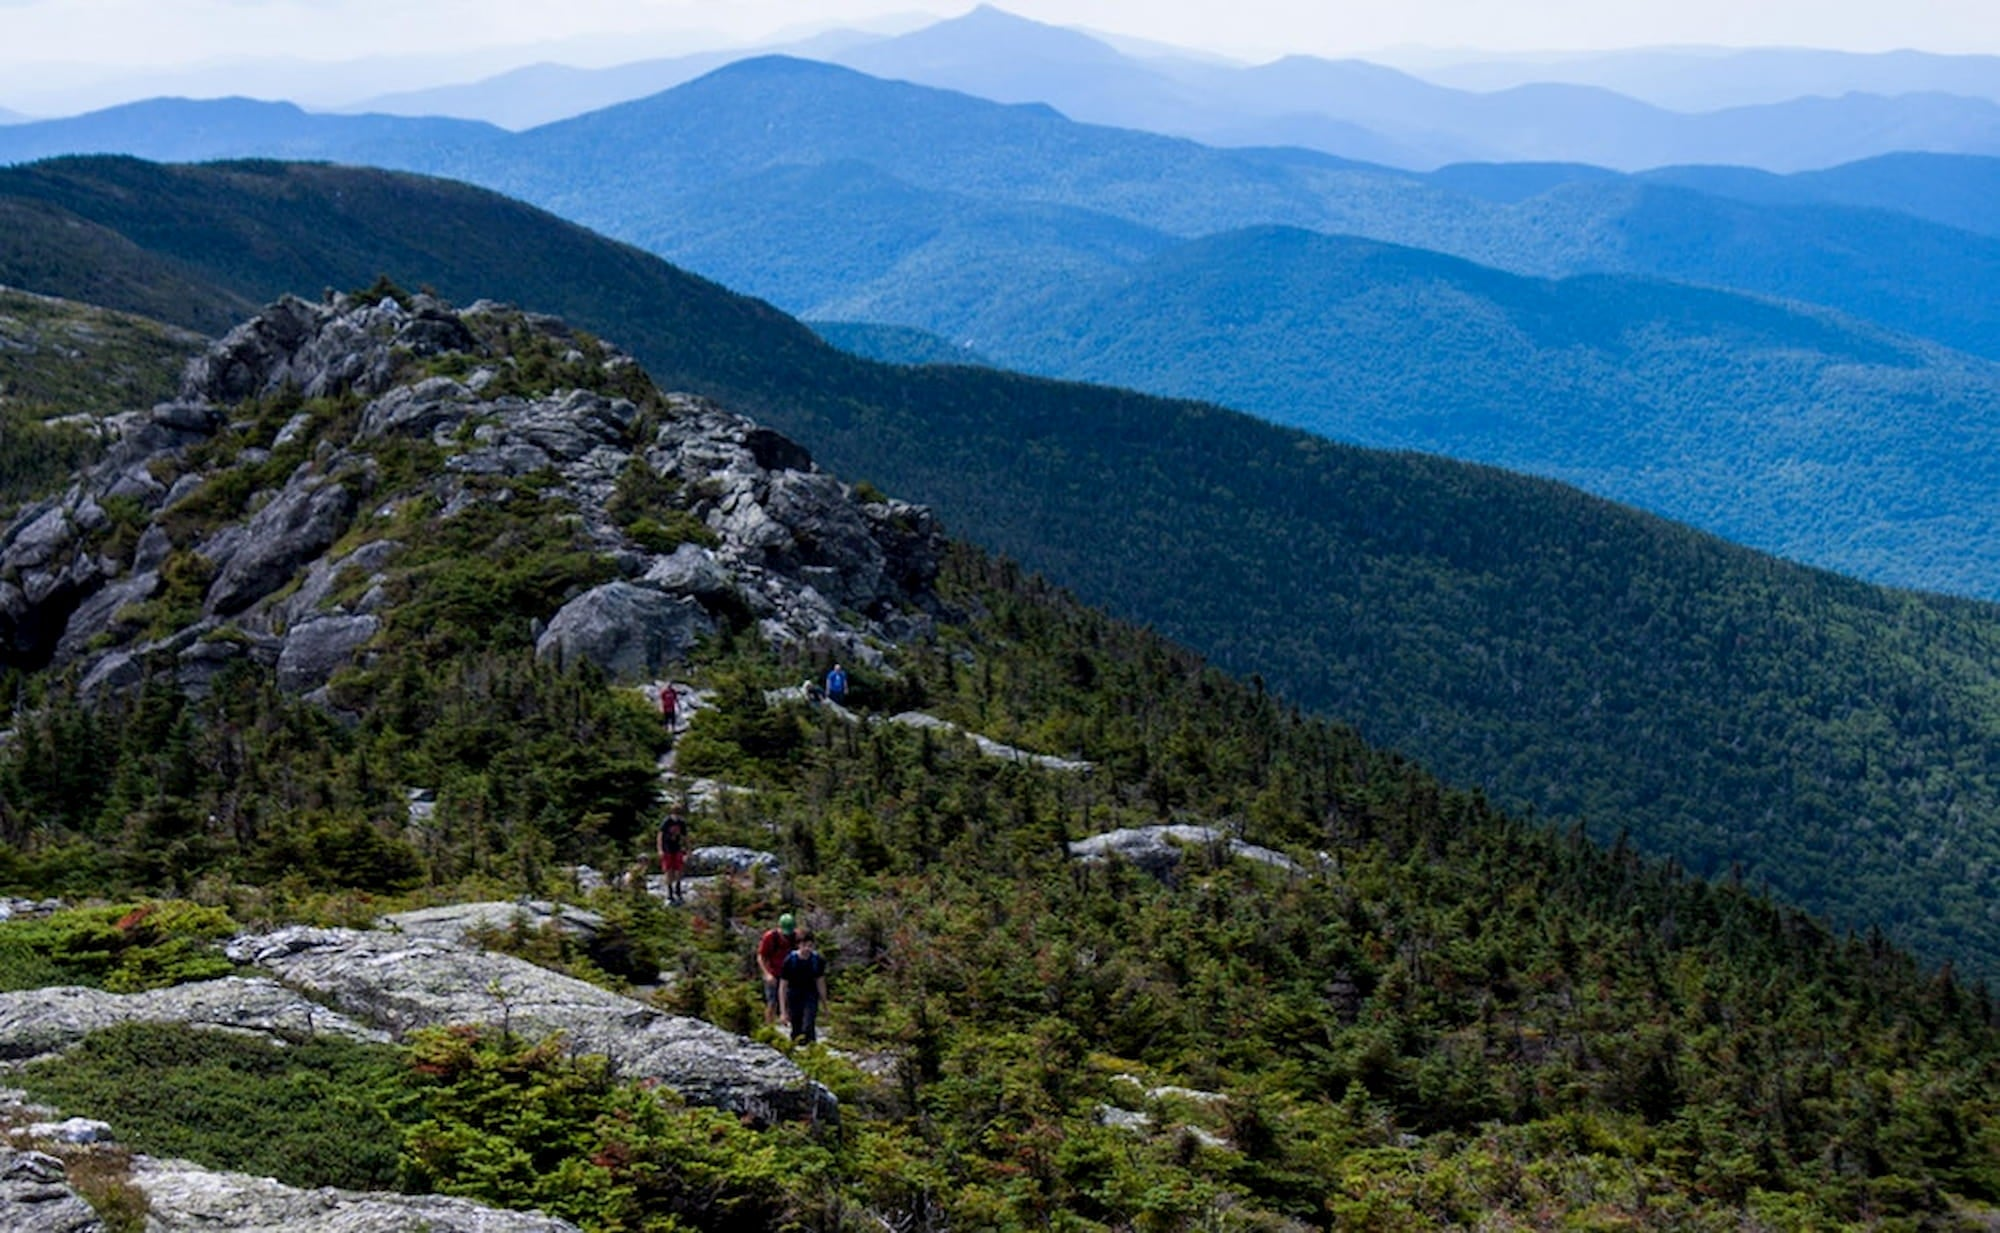 Hikers walking along the rocky ridge of Mt. Mansfield.